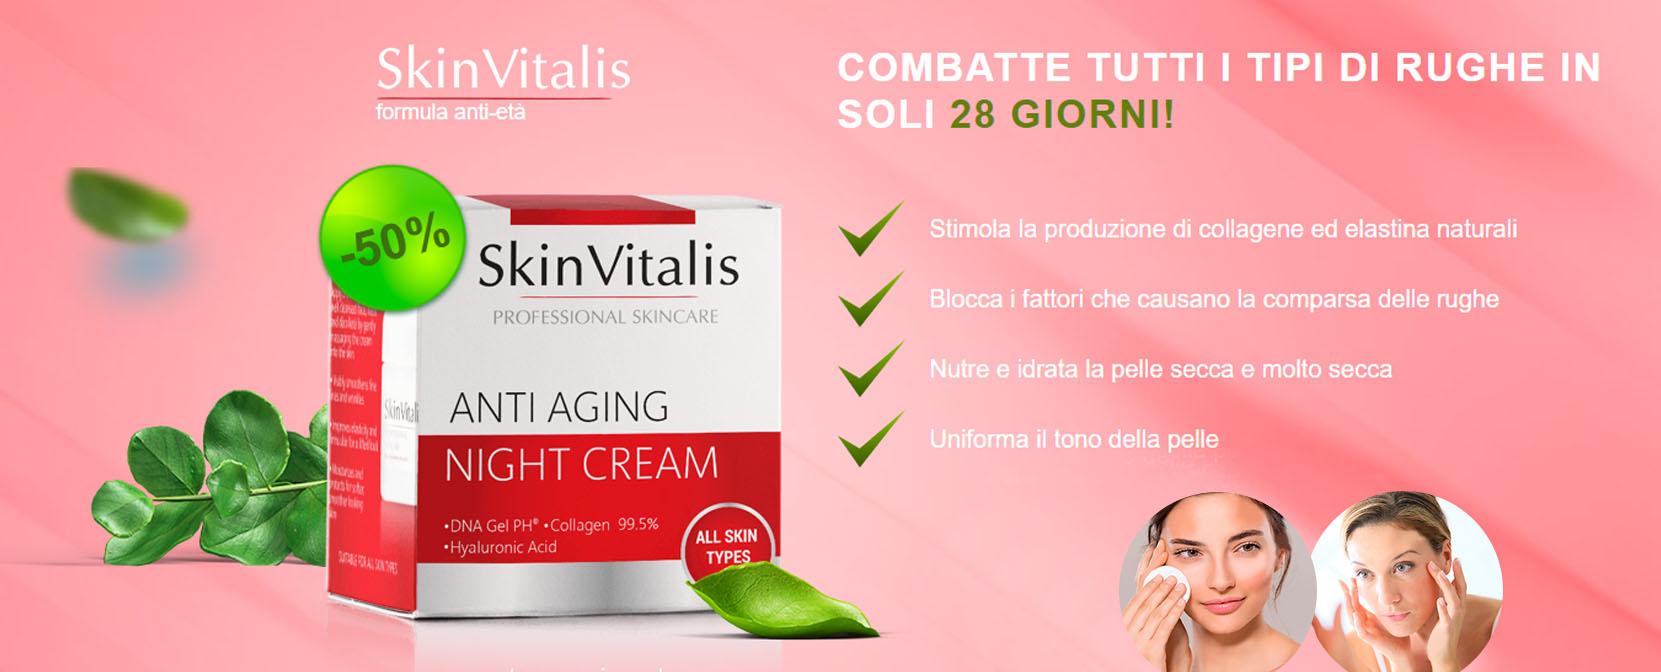 skin vitalis crema antirughe